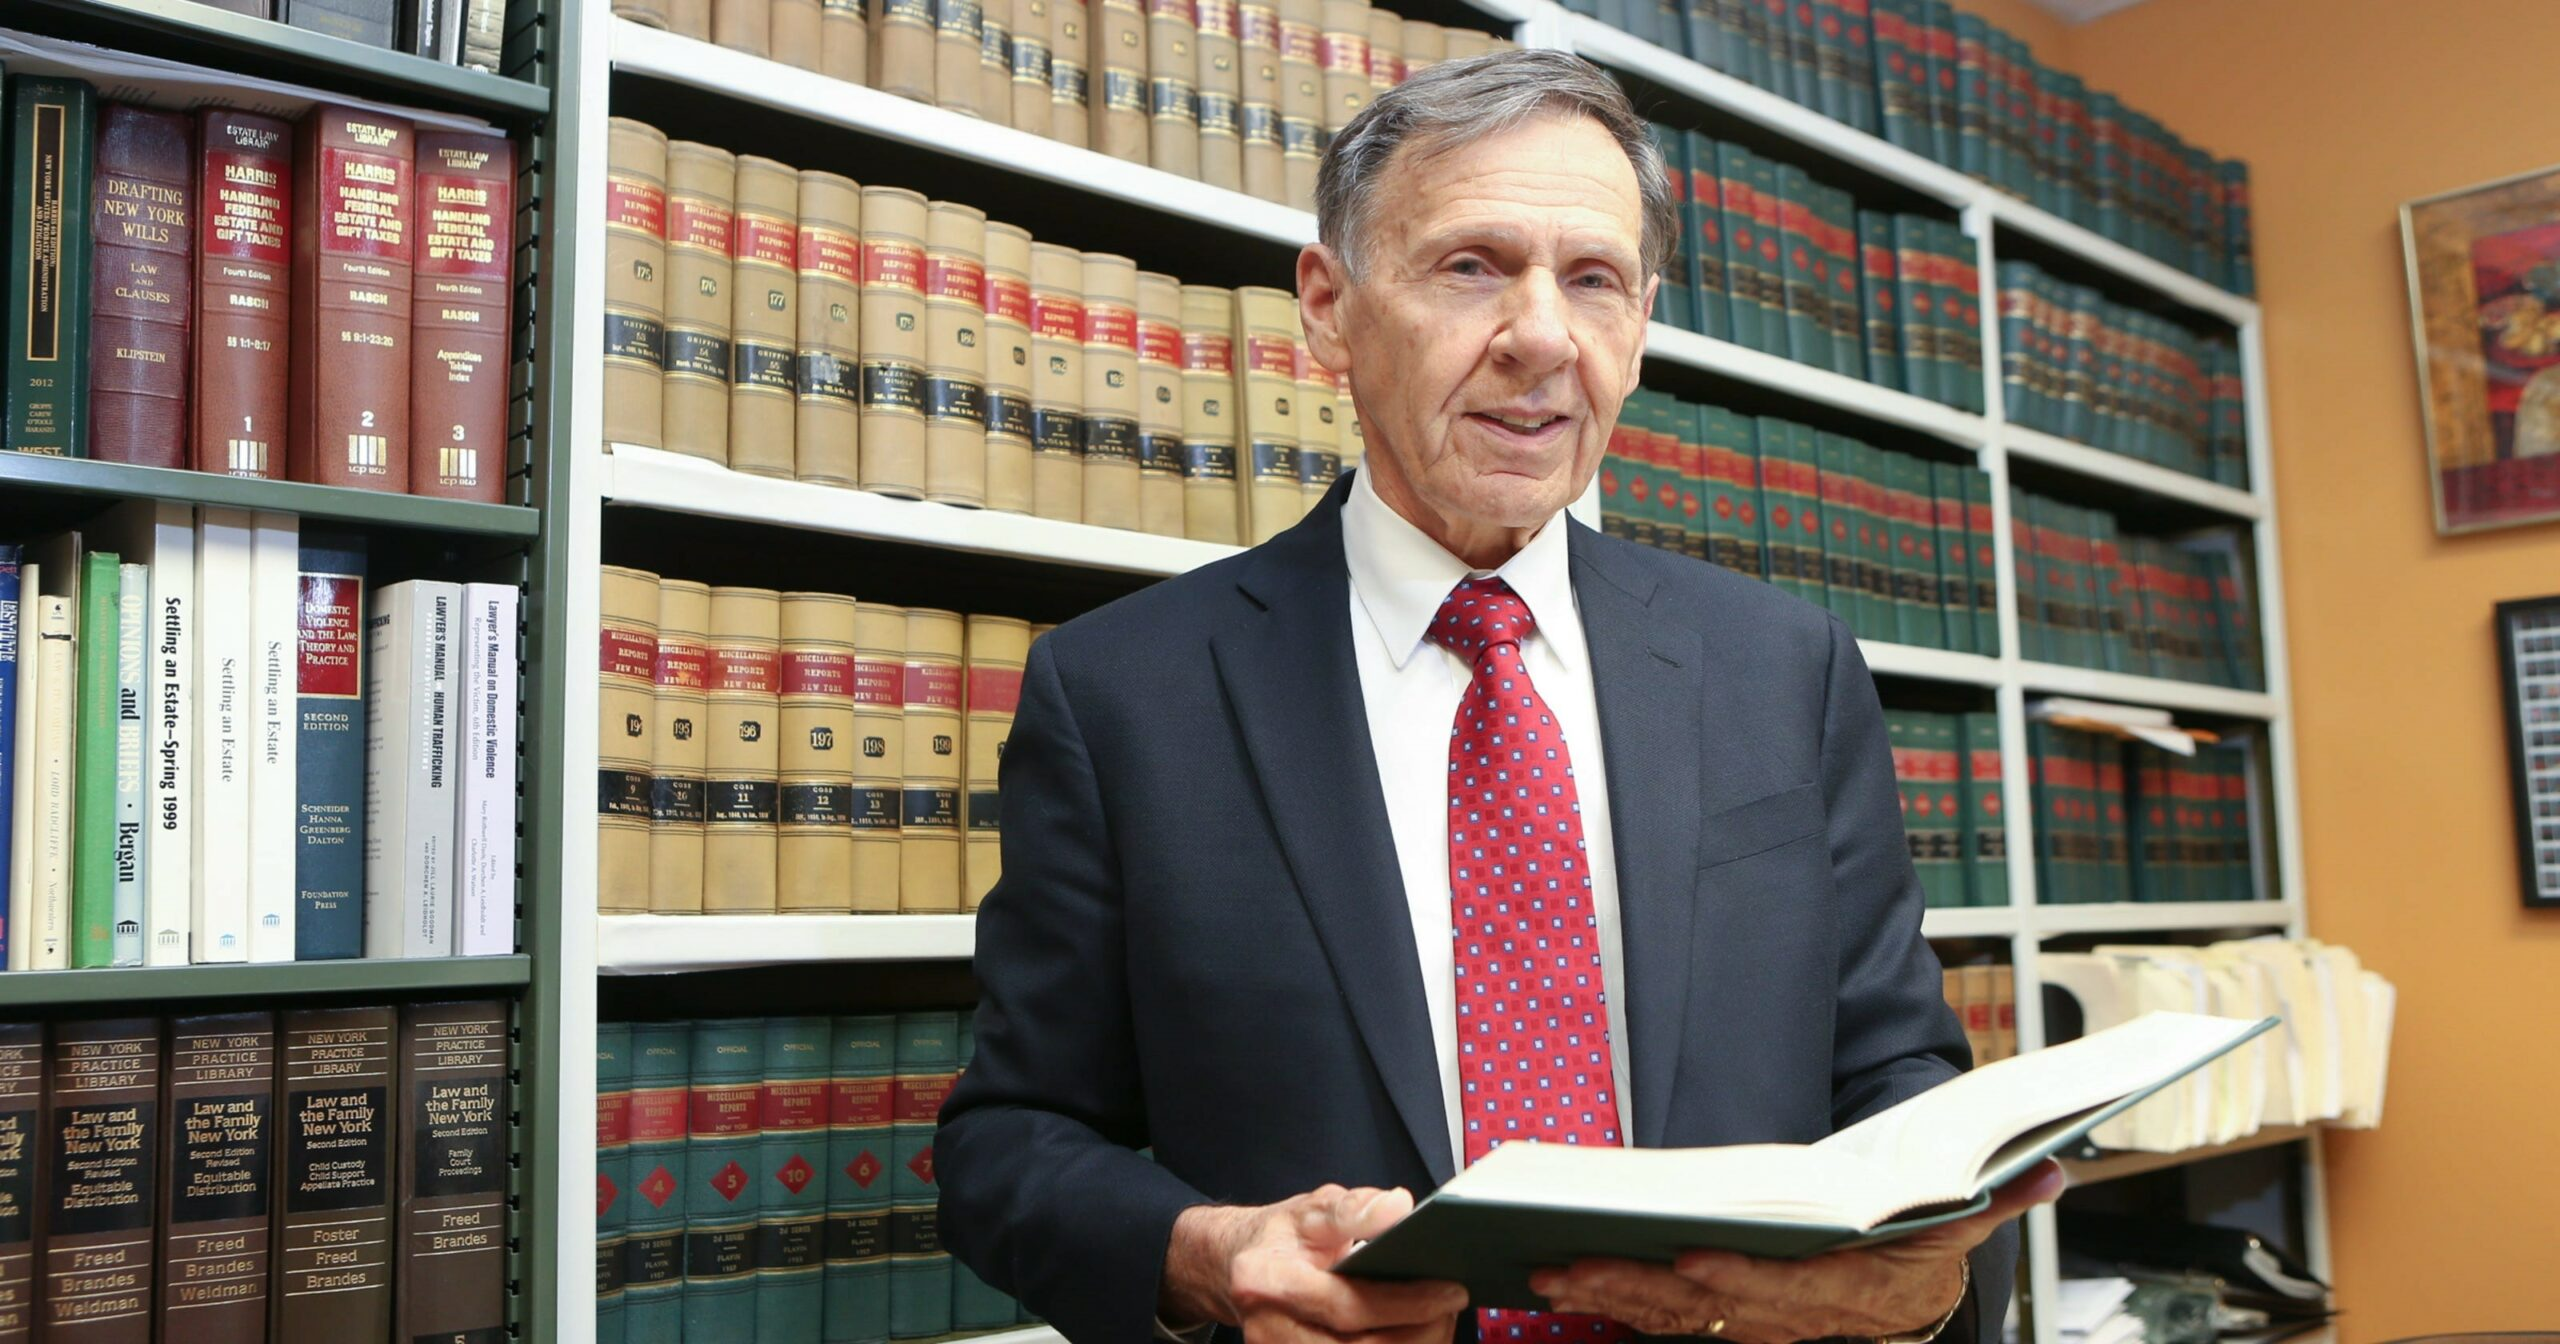 Judge Etelson